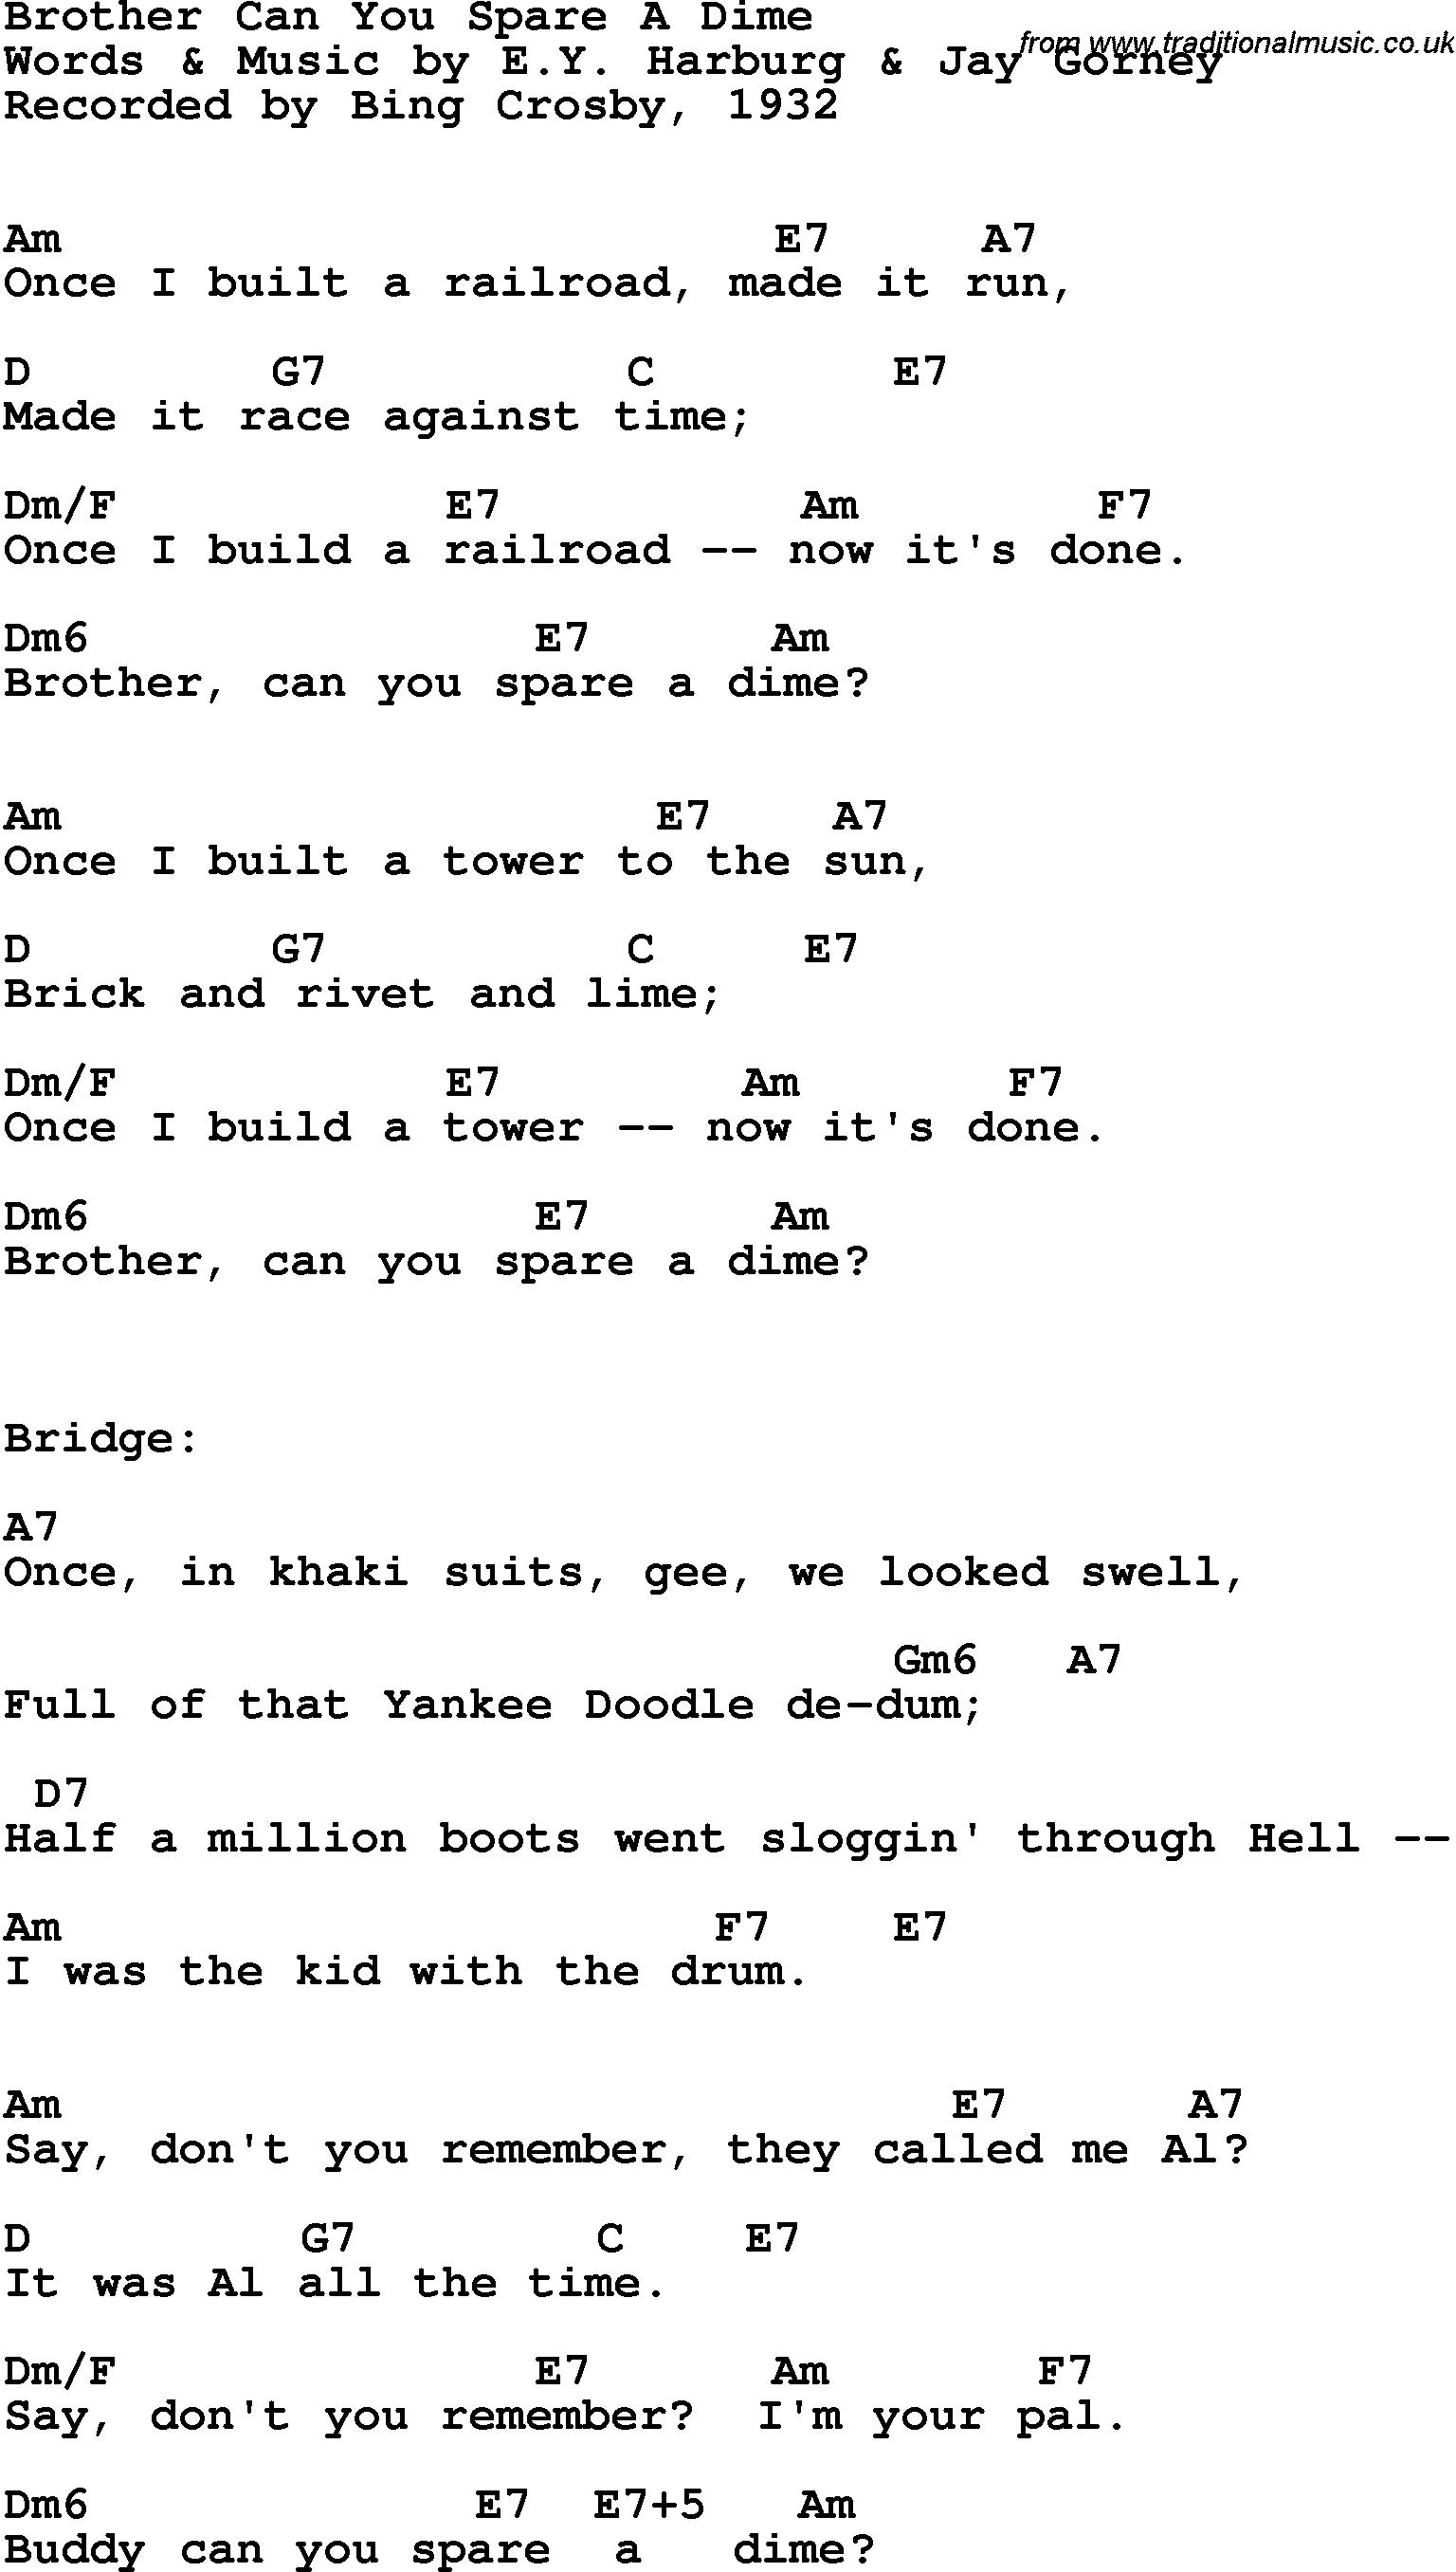 Gregg Allman - Brother To Brother Lyrics | Musixmatch